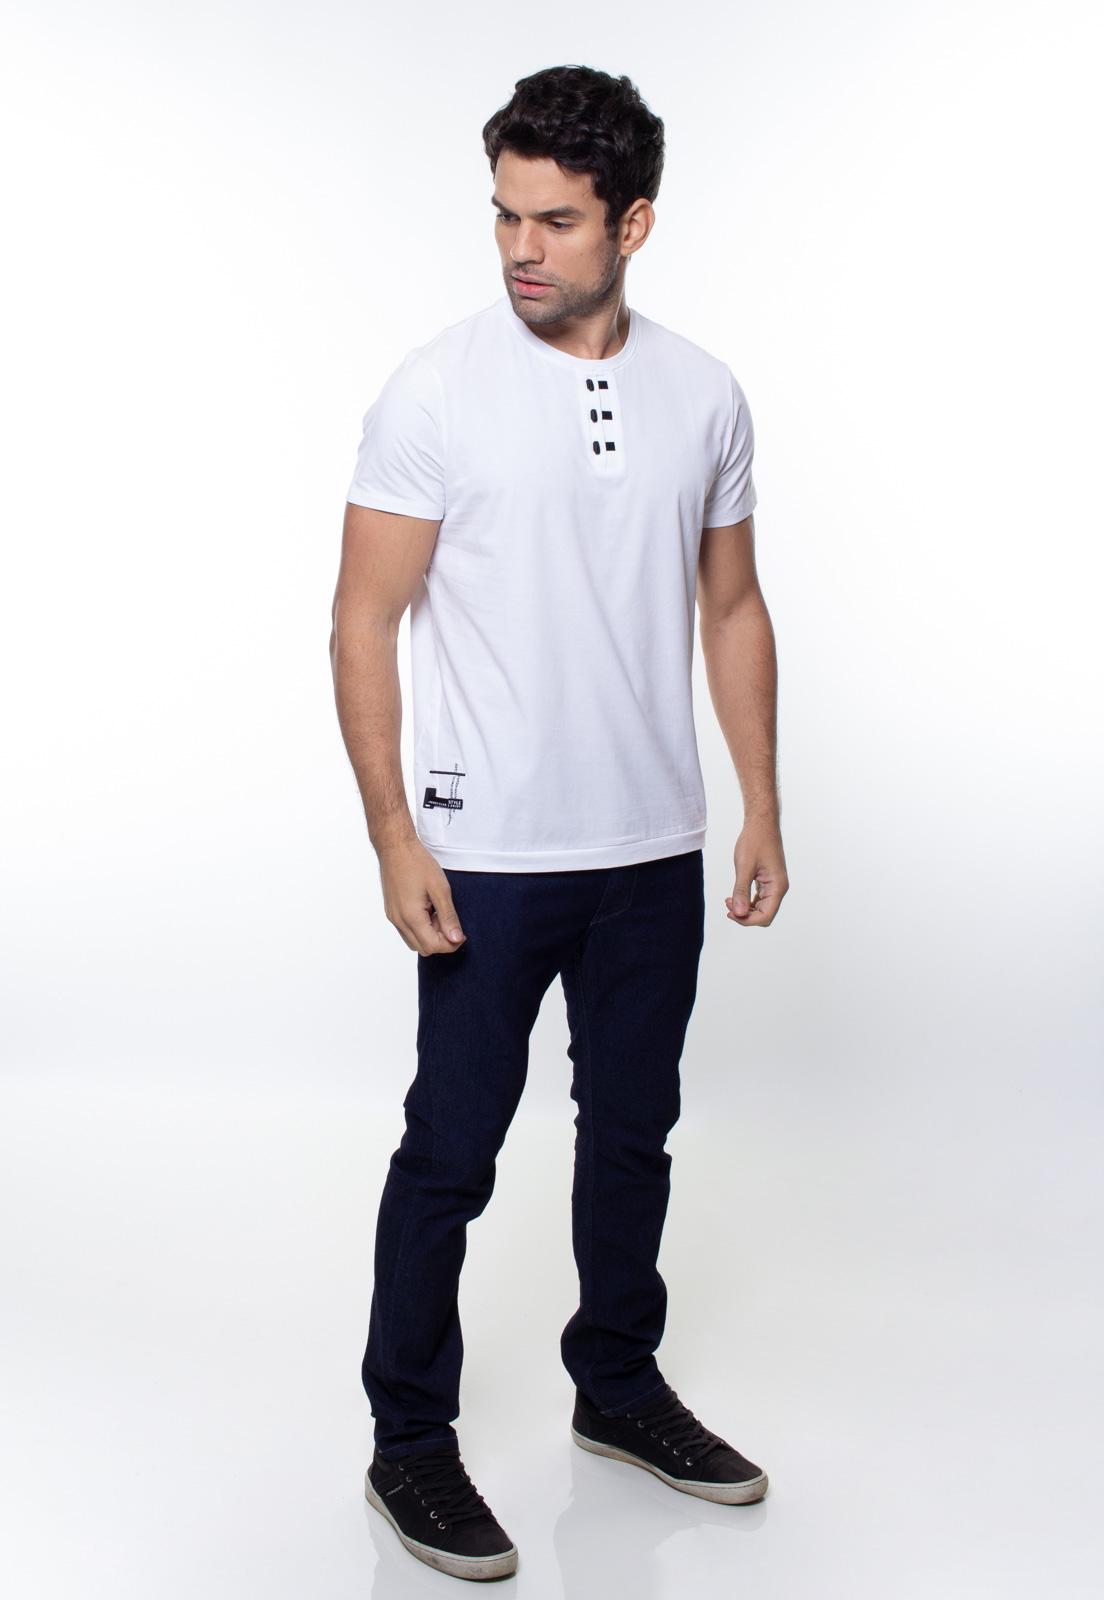 Camiseta Masculina Manga Curta Crocker - 47846  - CROCKER JEANS